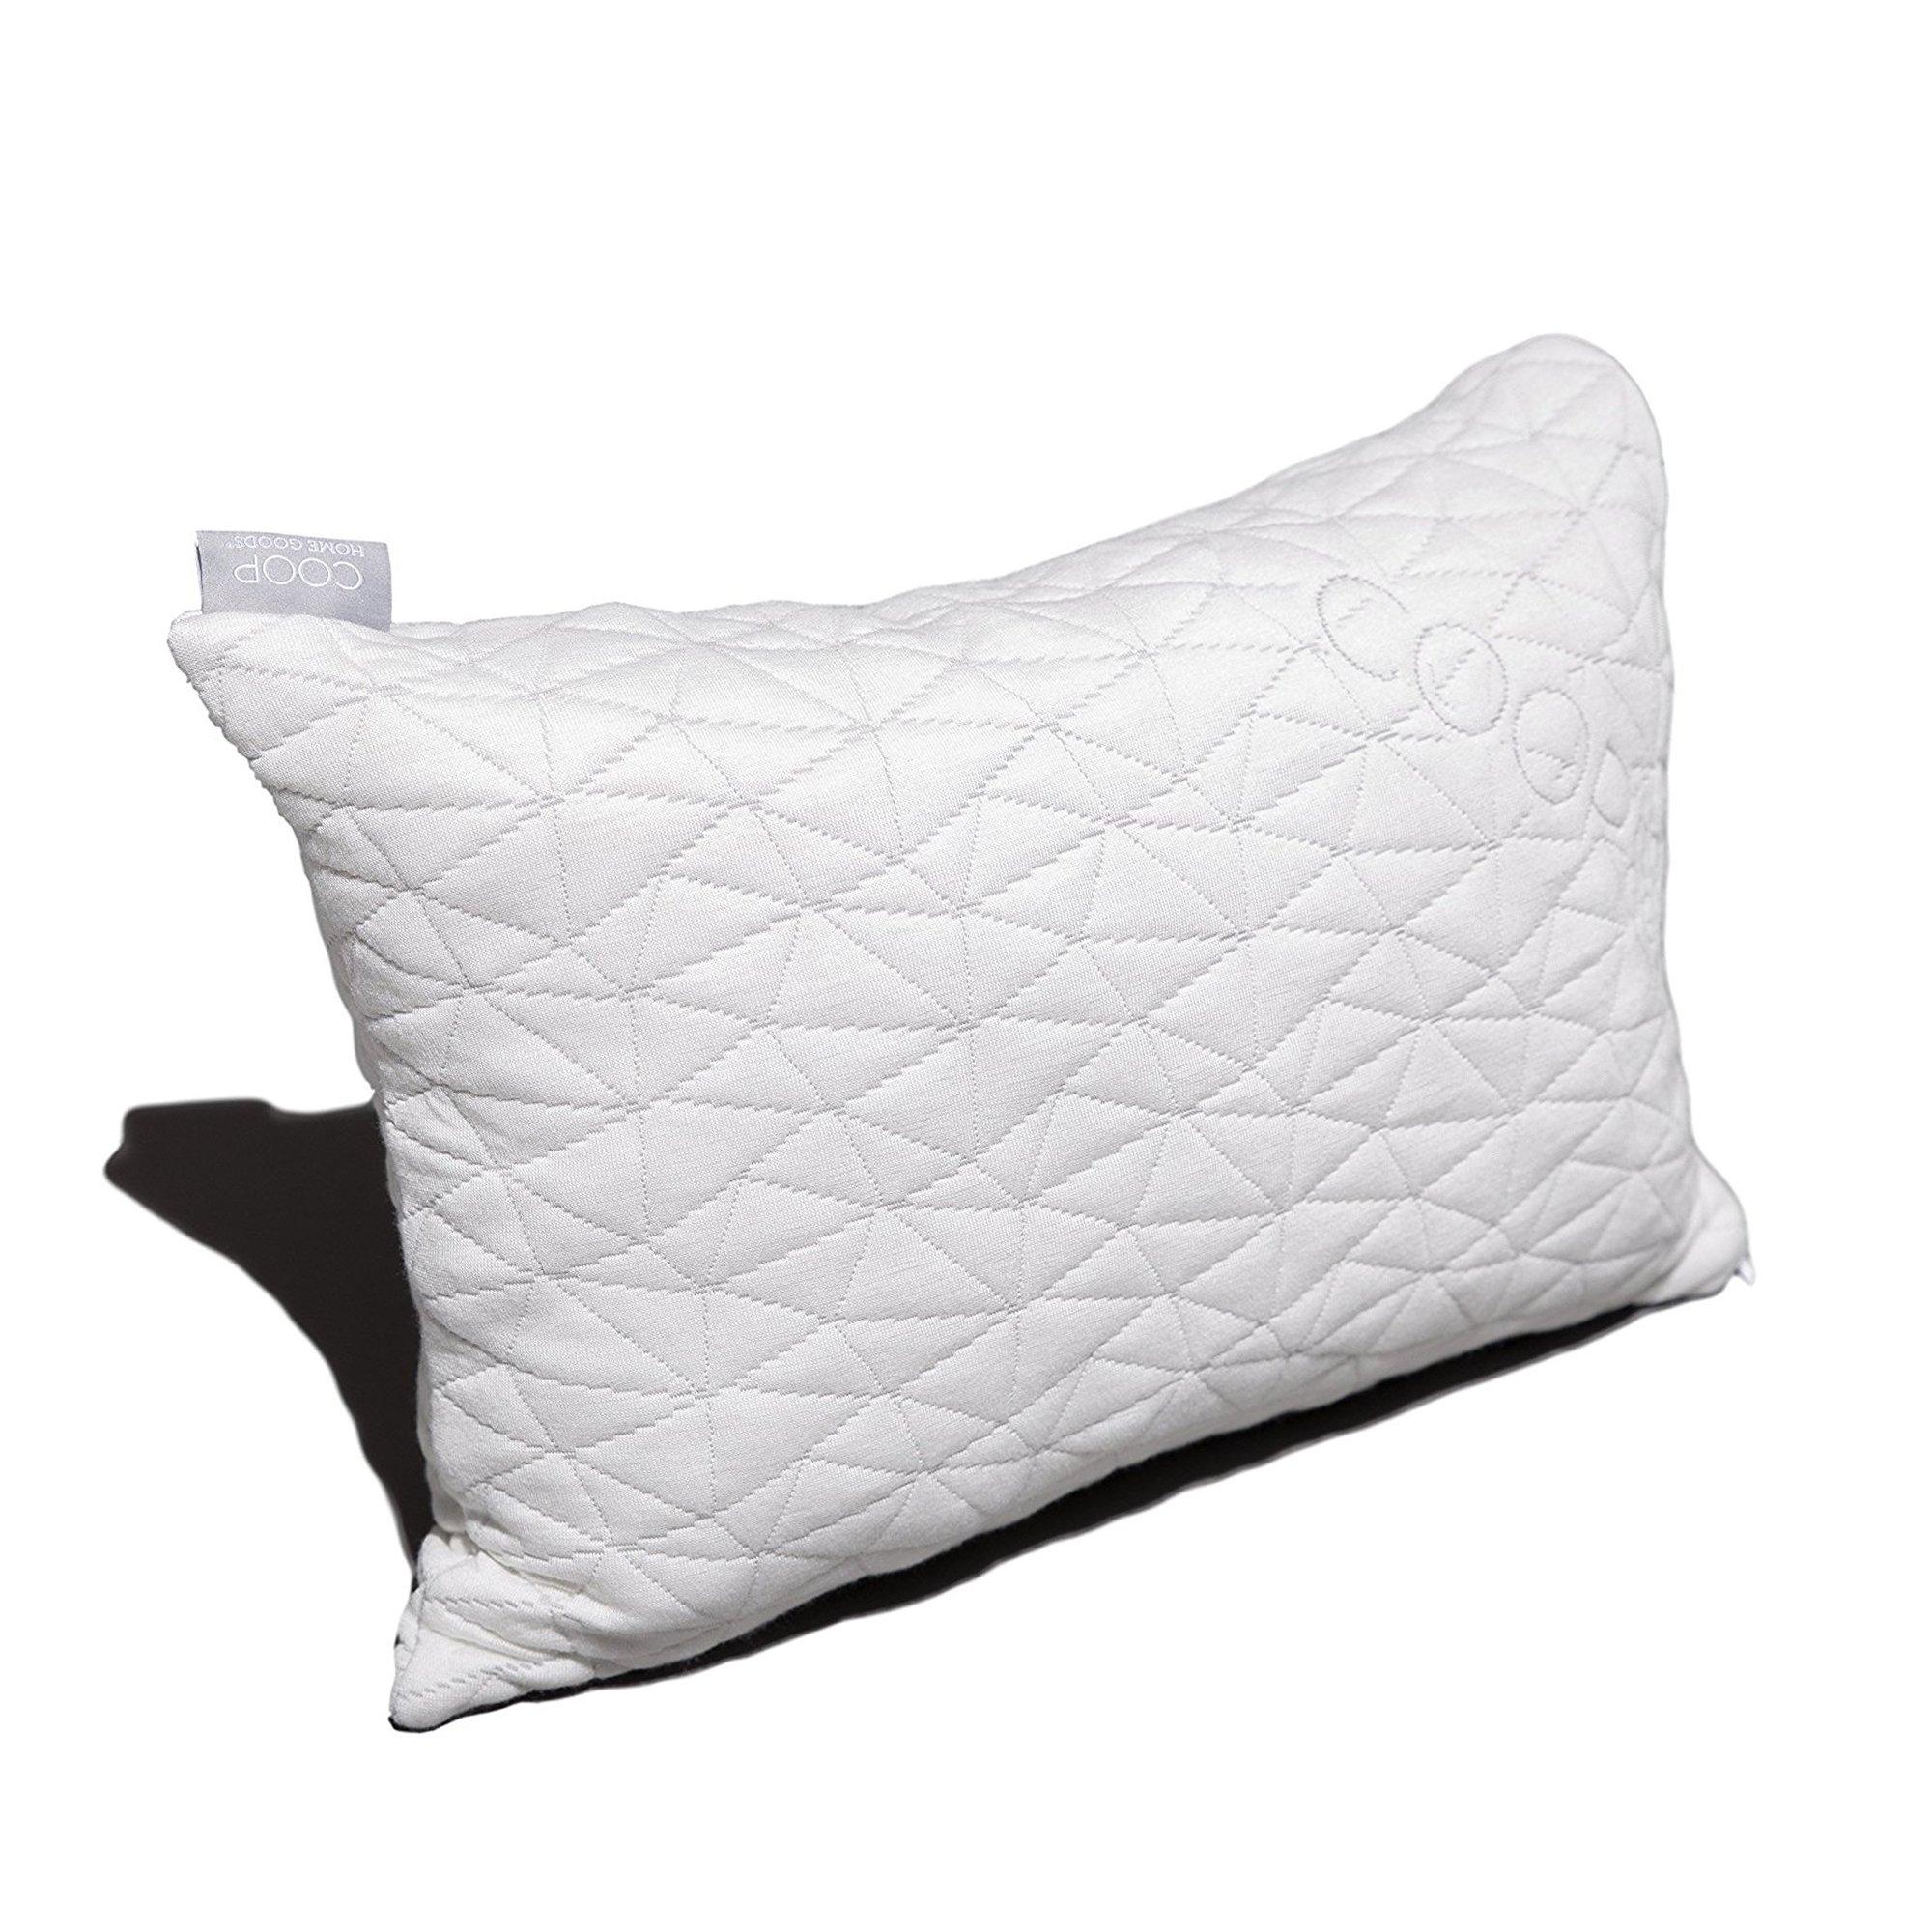 neck buckwheat of free hull viscose pillows bamboo standard pillow premium modern from